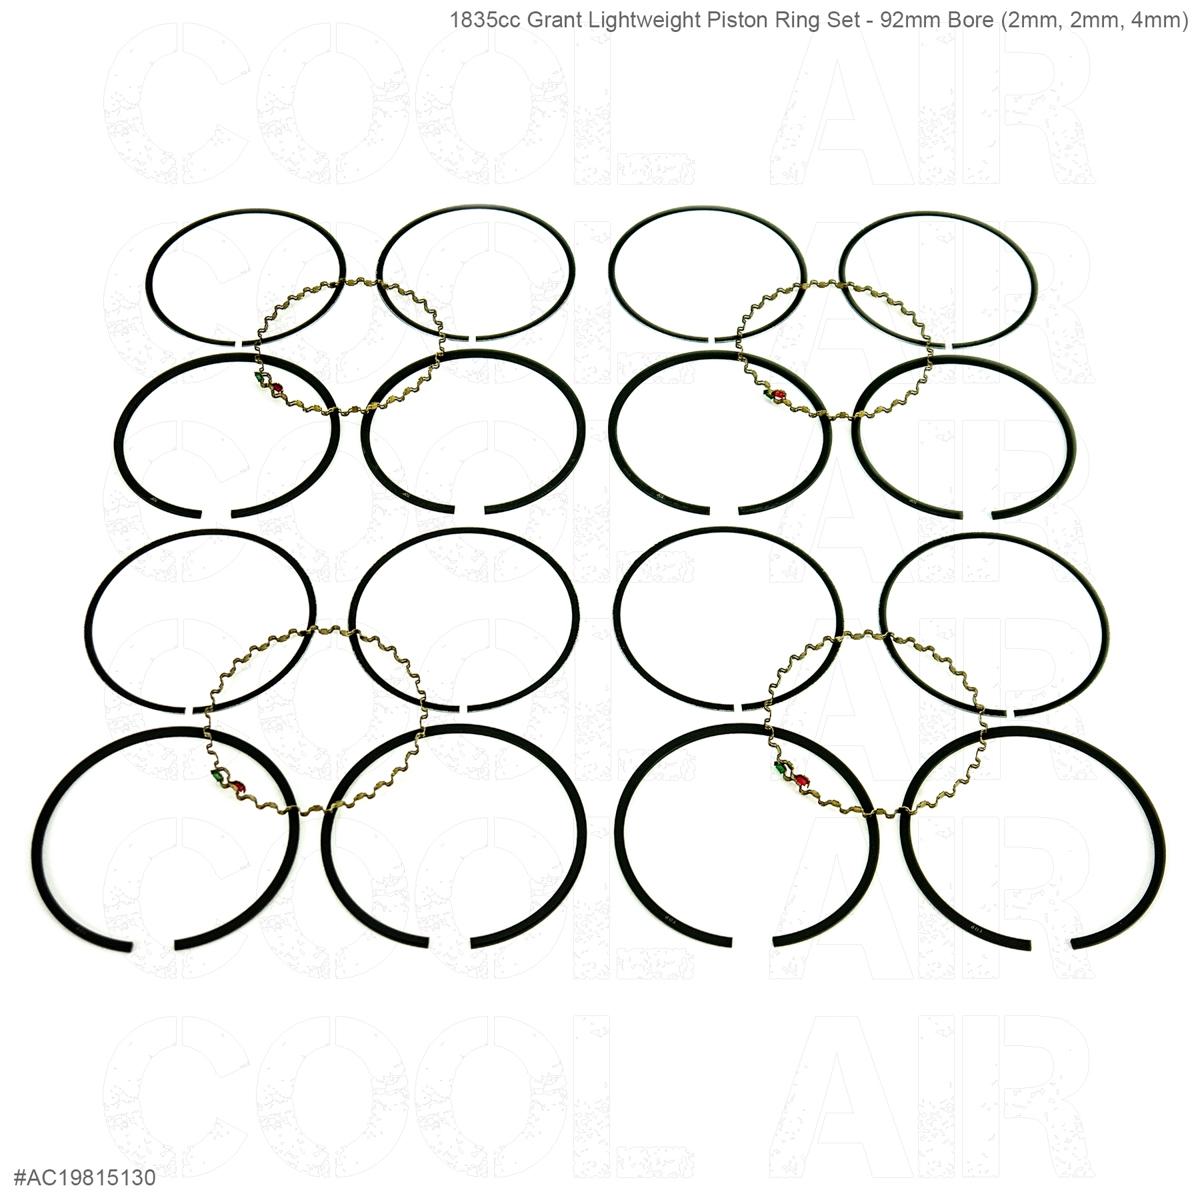 1835cc Grant Lightweight Piston Ring Set - 92mm Bore (2mm, 2mm, 4mm)